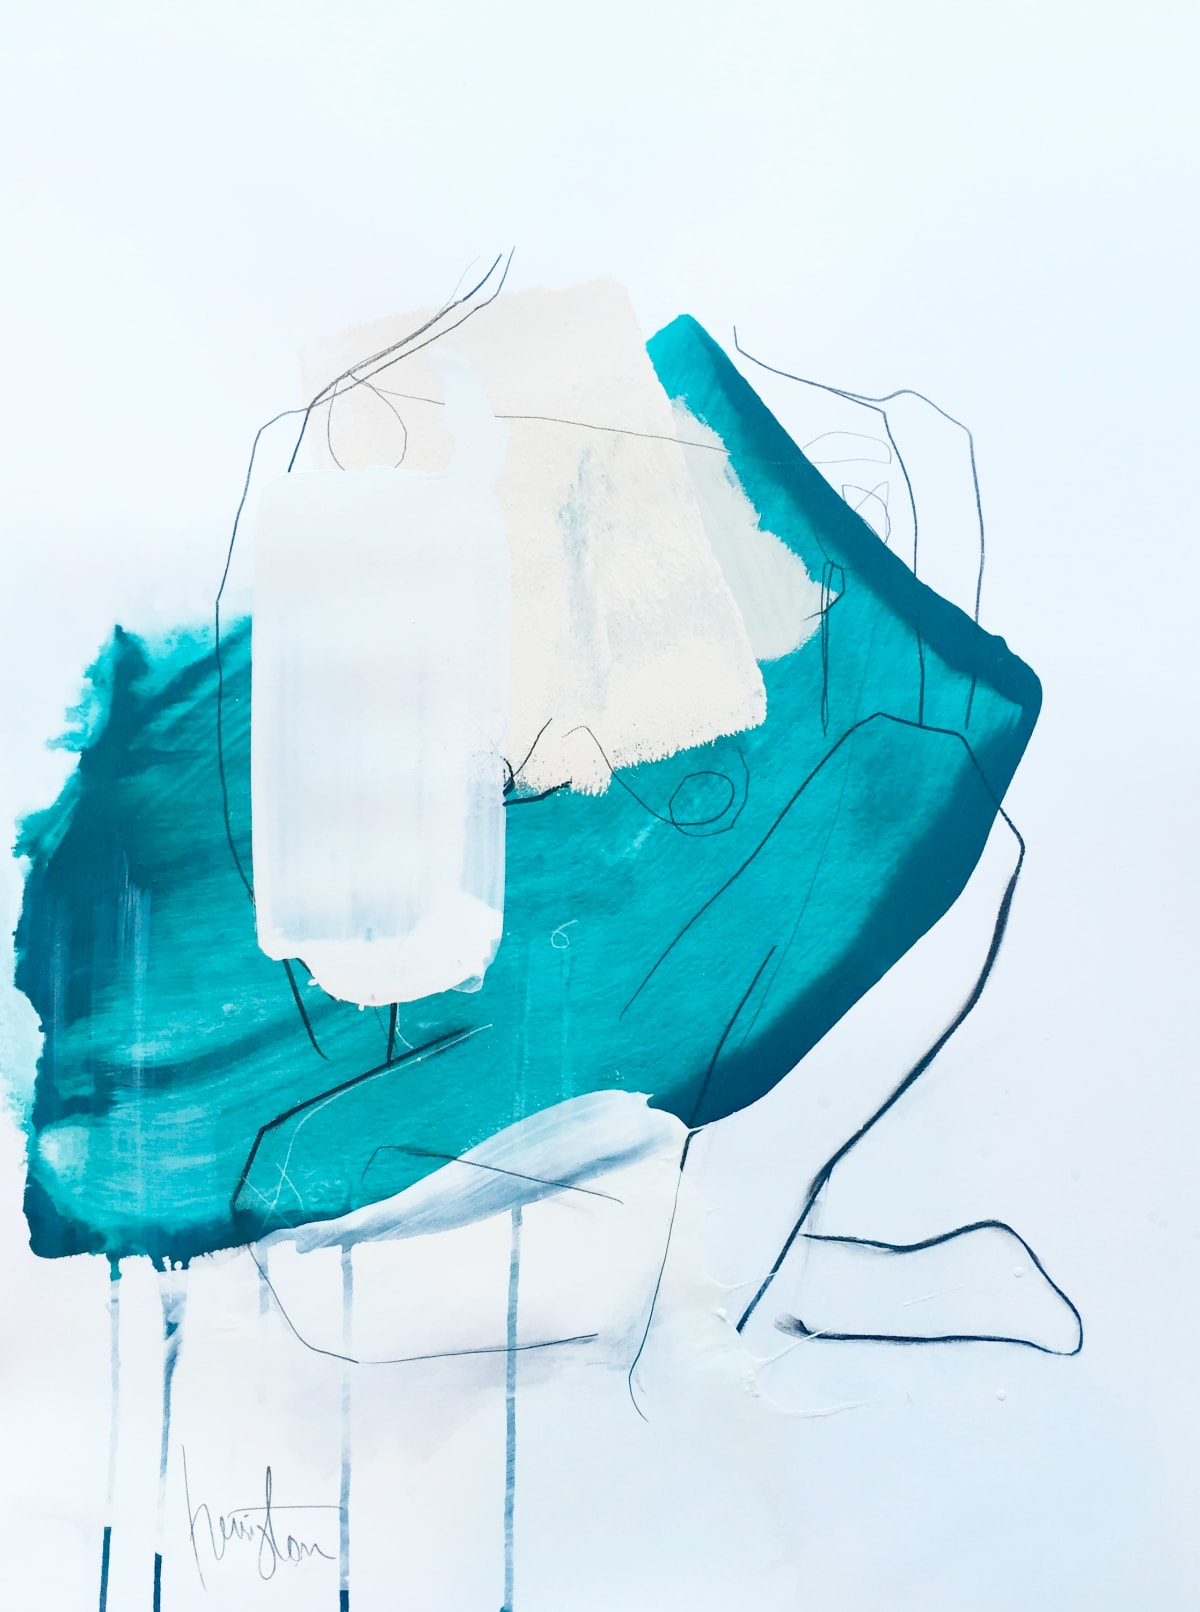 "Melissa Herrington Celestial Oceans of Aquas VI Mixed Media on Paper 18 x 24"" framed"